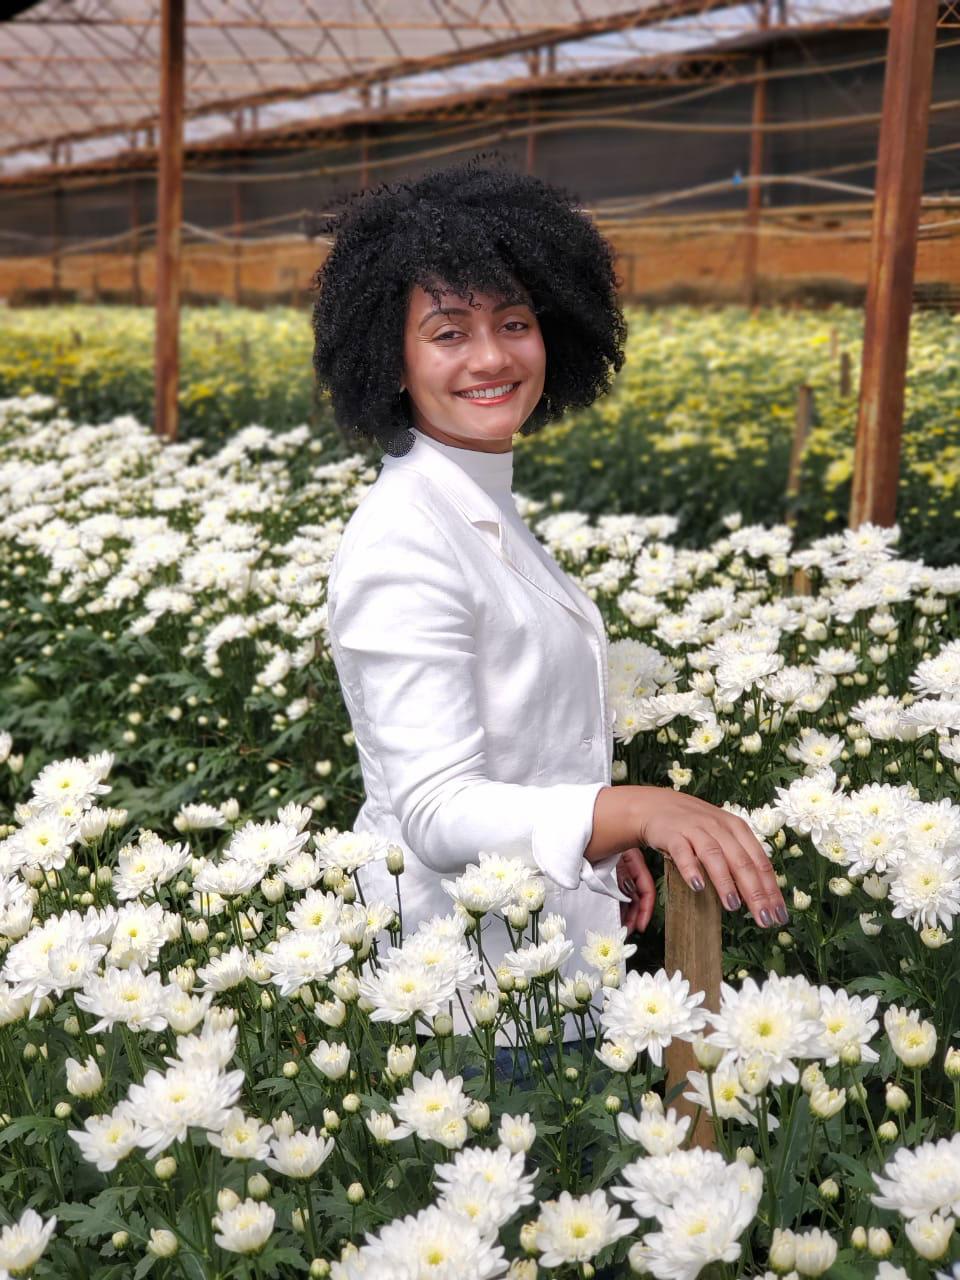 enfermeira sorrindo jardim flores brancas